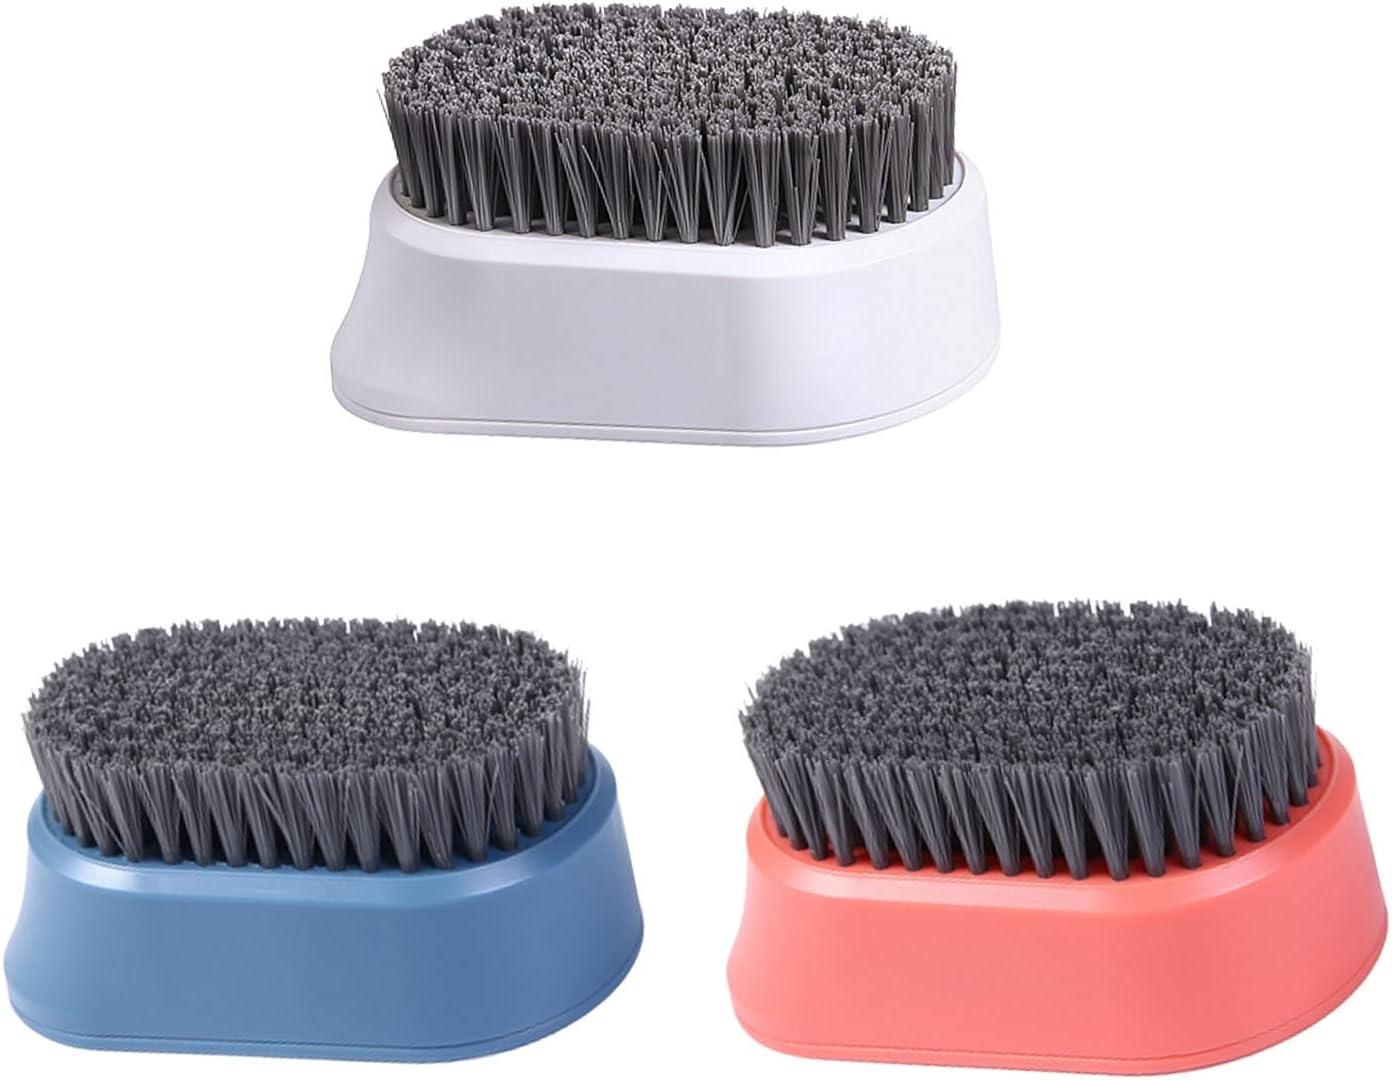 Nylon Soft Bristle Ranking TOP7 Brush Cleaning Tools 3 Color Set Memphis Mall Mi : of